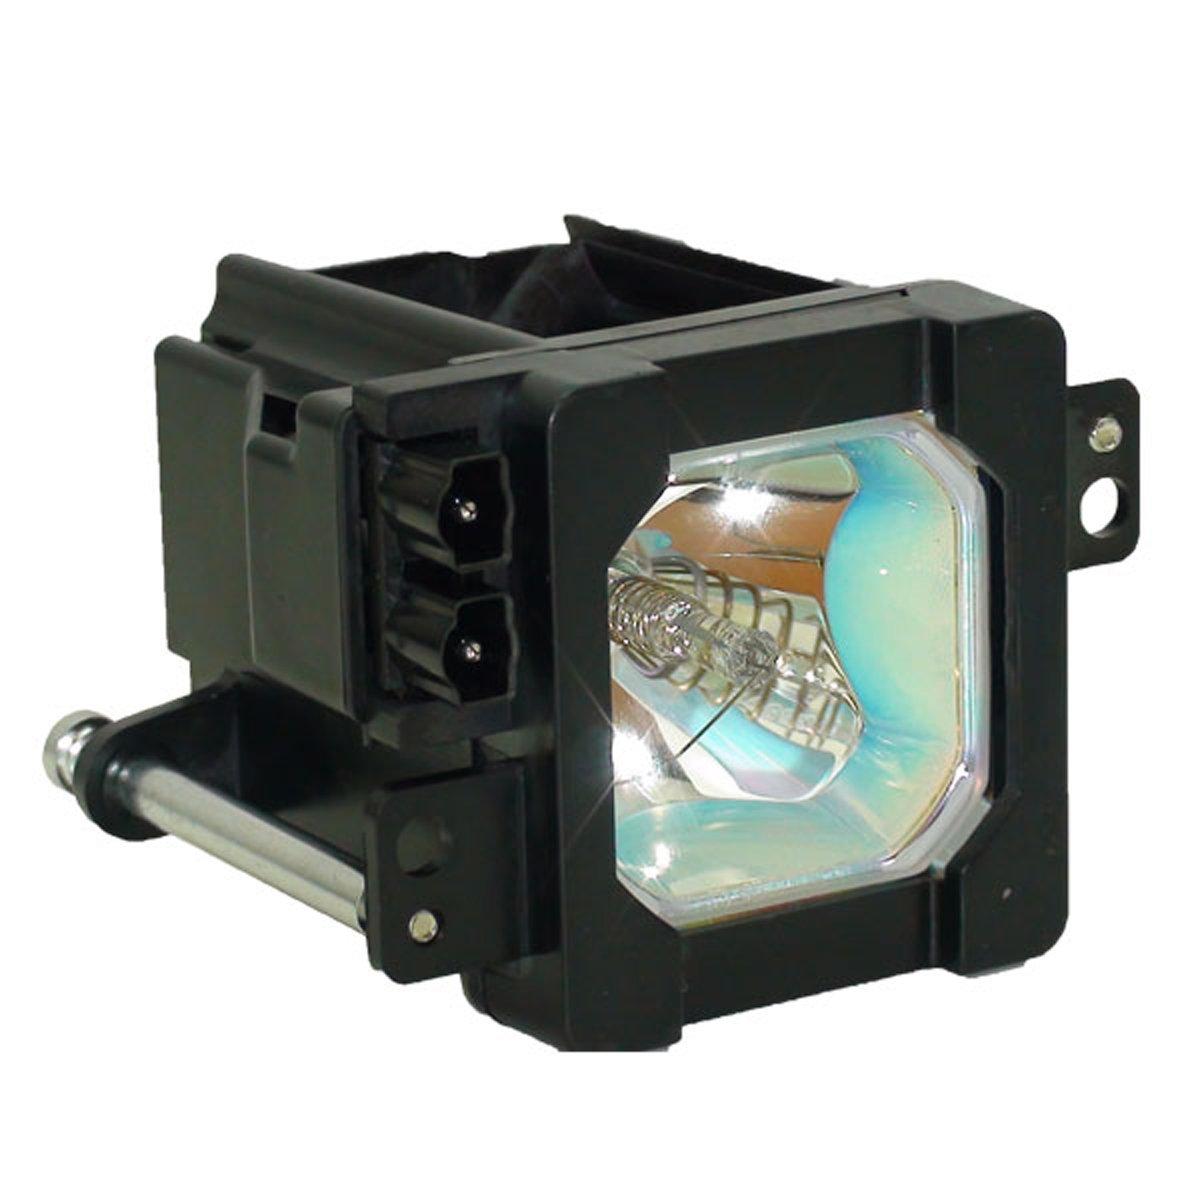 HD-56G887 HD56G887 TS-CL110UAA TSCL110UAA Replacement JVC TV Lamp